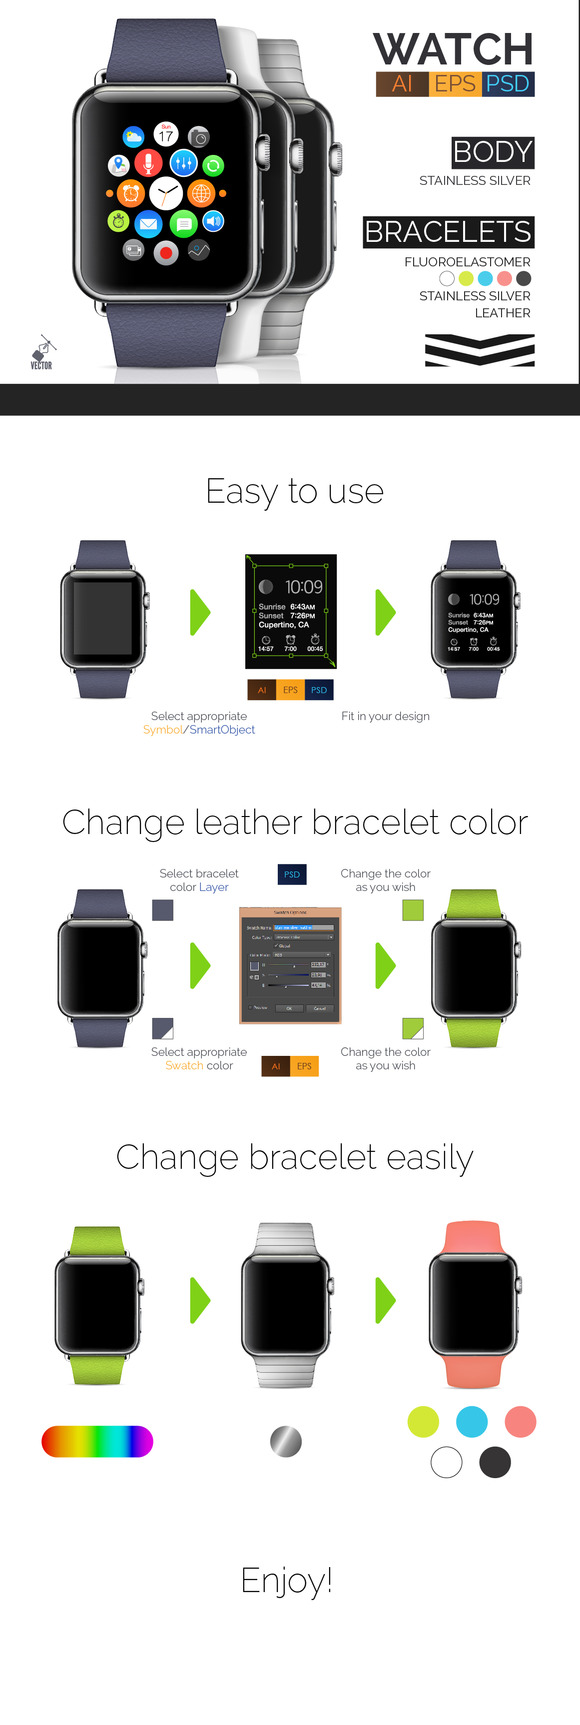 Stainless Apple Watch BONUS